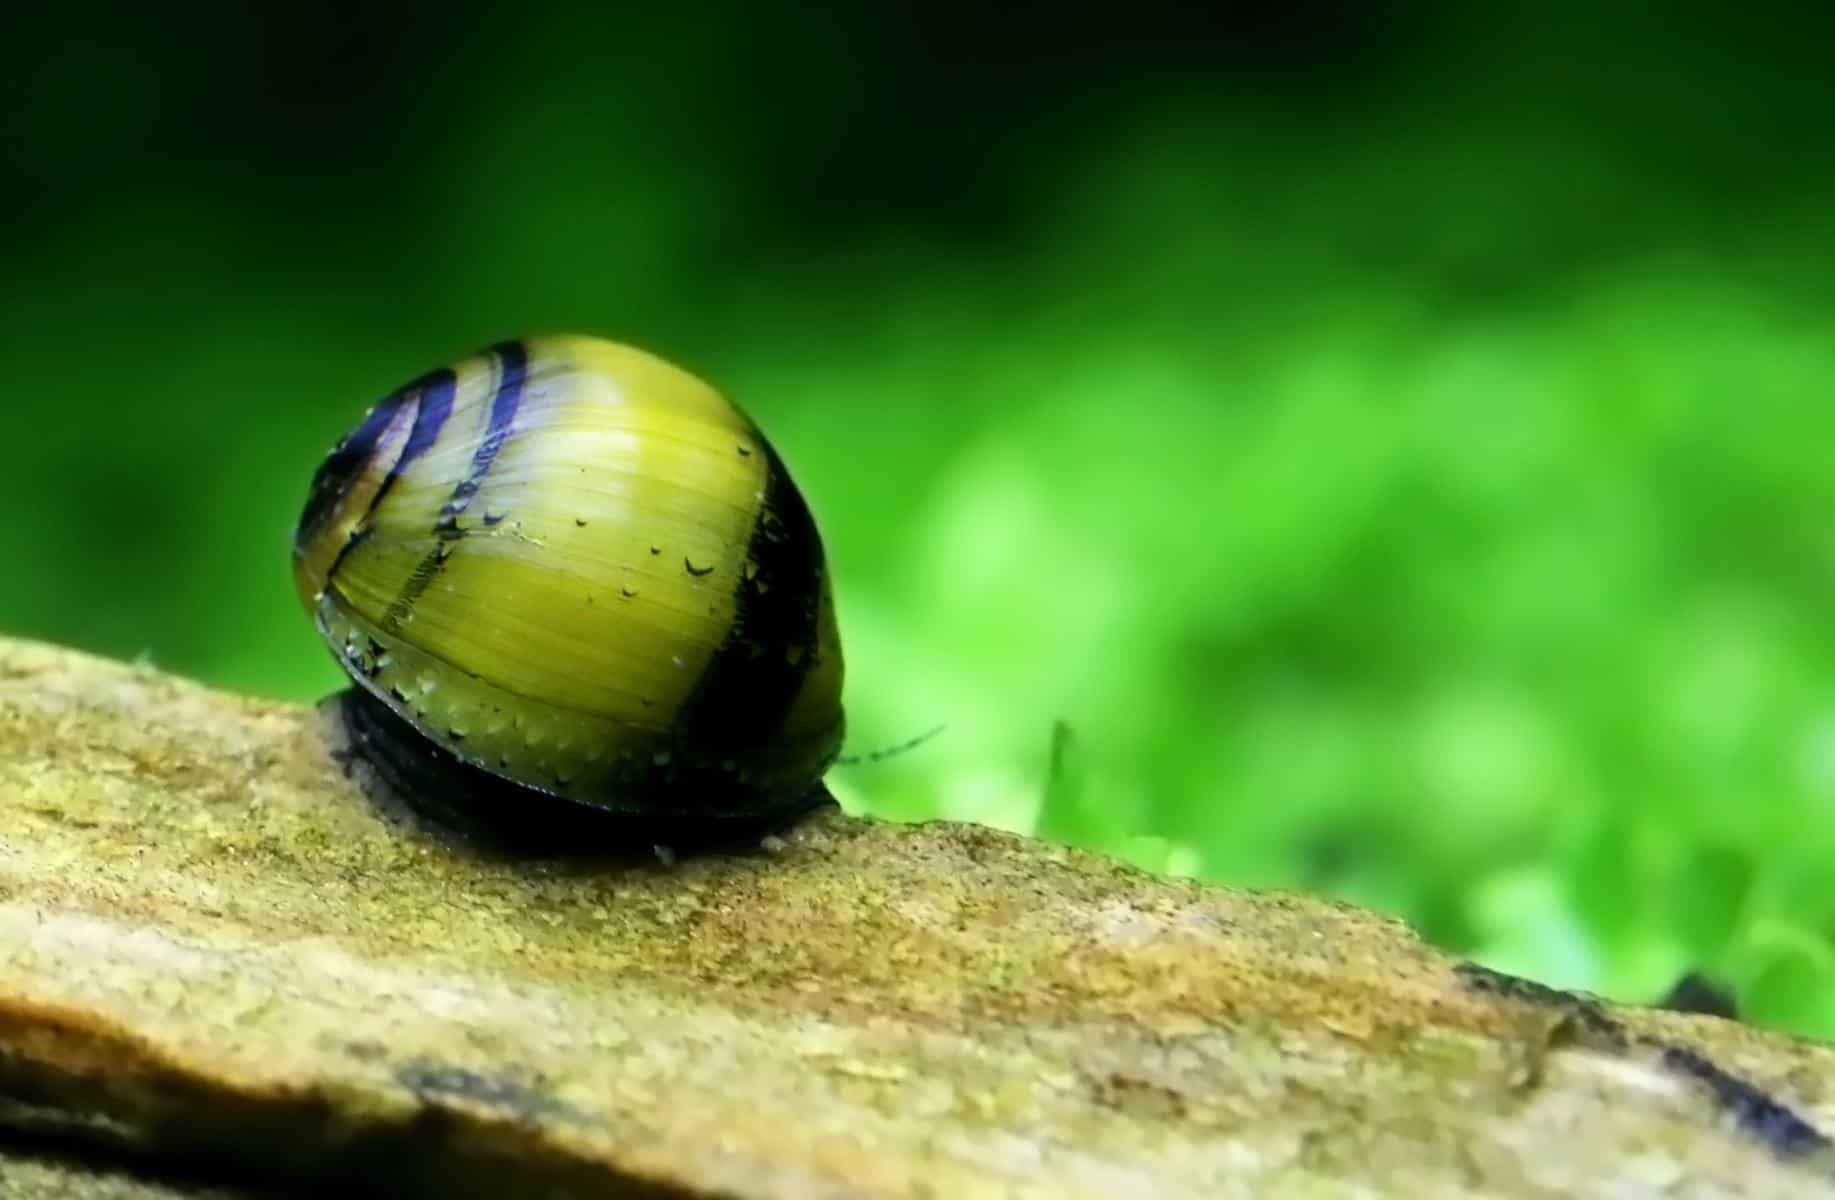 bumblebee snail in aquarium